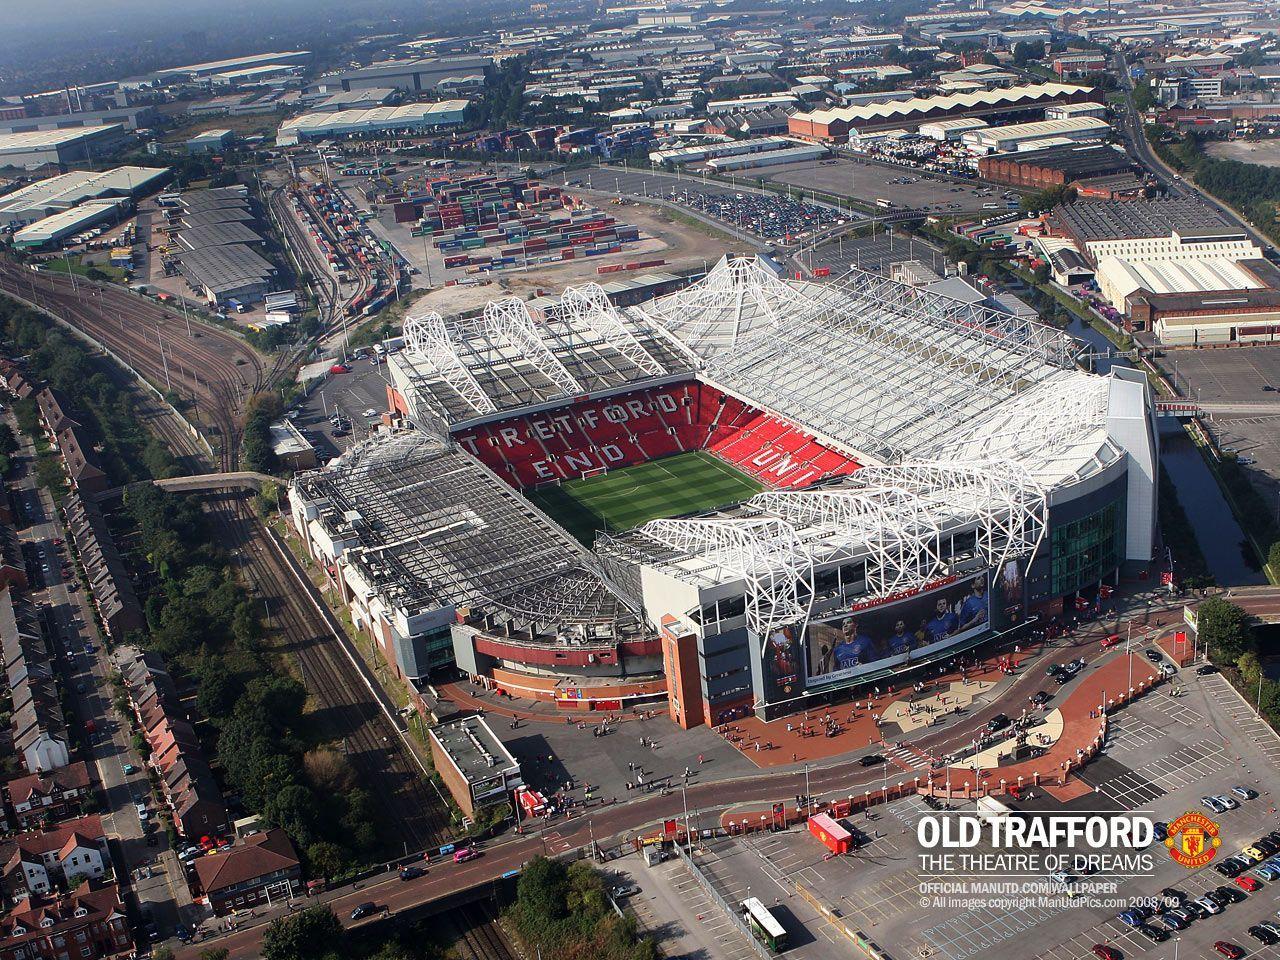 Old Trafford Manchester Old Trafford Manchester United Manchester United Football Club